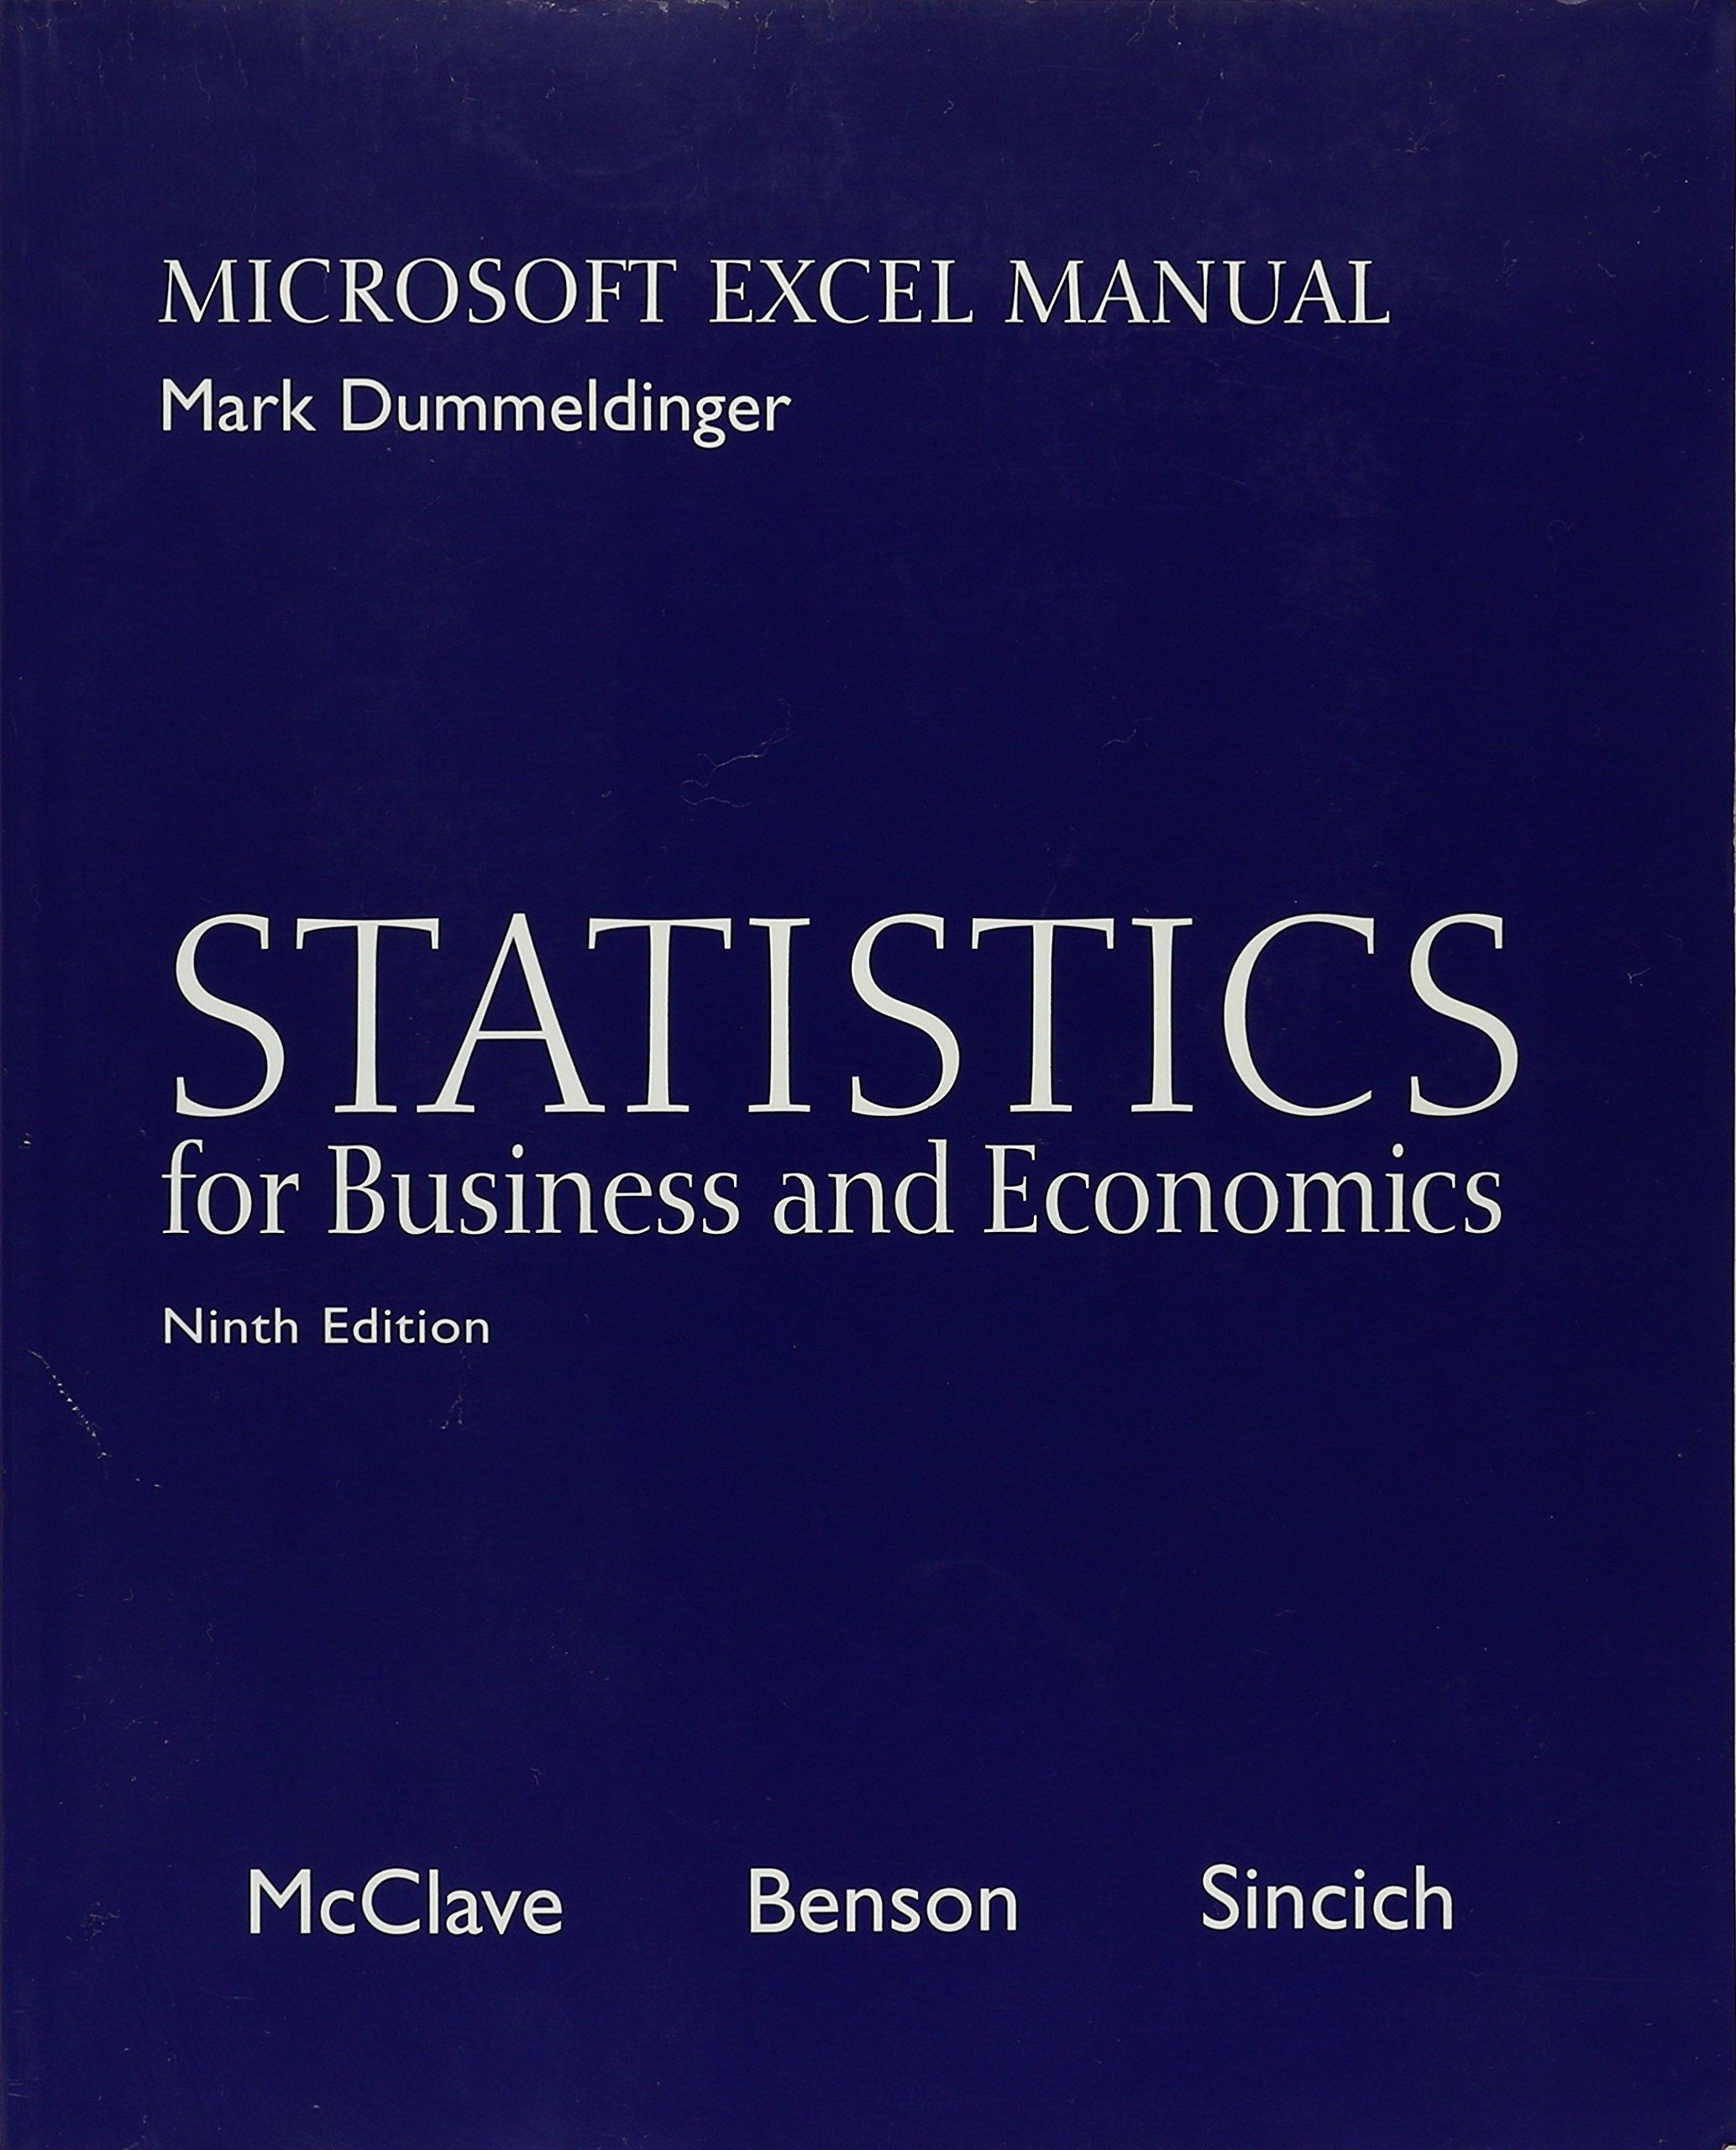 Statistics for Business and Economics: Microsoft Excel Manual (9th Ed,  w/CD): Mark Dummeldinger, McClave, Benson, Sincich: 9780130466495:  Amazon.com: Books